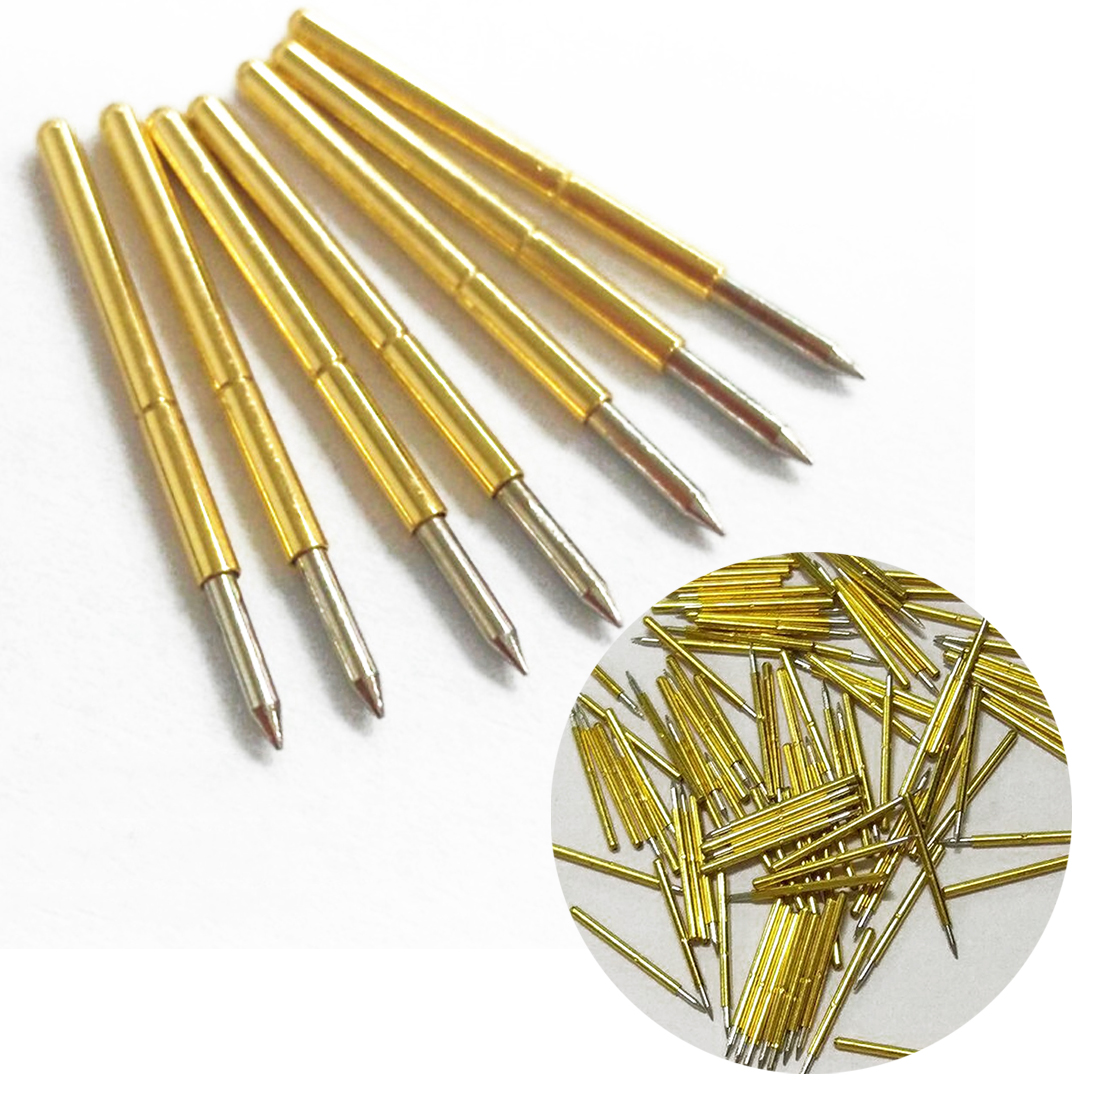 100PCS Metal Spring Test Probe Pin Pressure Insulated Quick Piercing Test Probe Cone Needle Round Pogo Pin Tools P50-J1//P50-B1//P75-B1//P75-E2//P100-E2 0.68mm